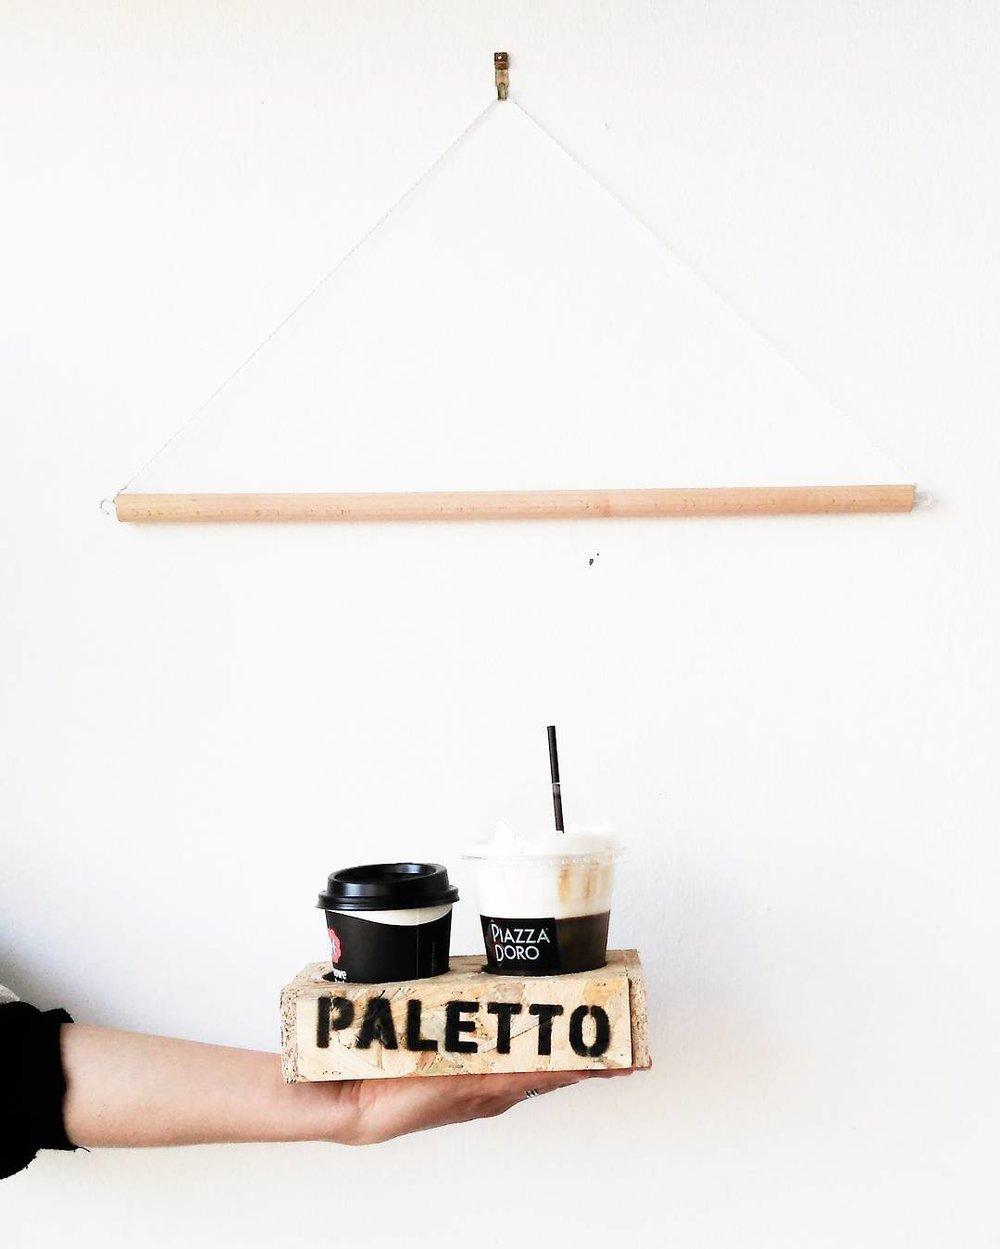 PALETTO BRANDING